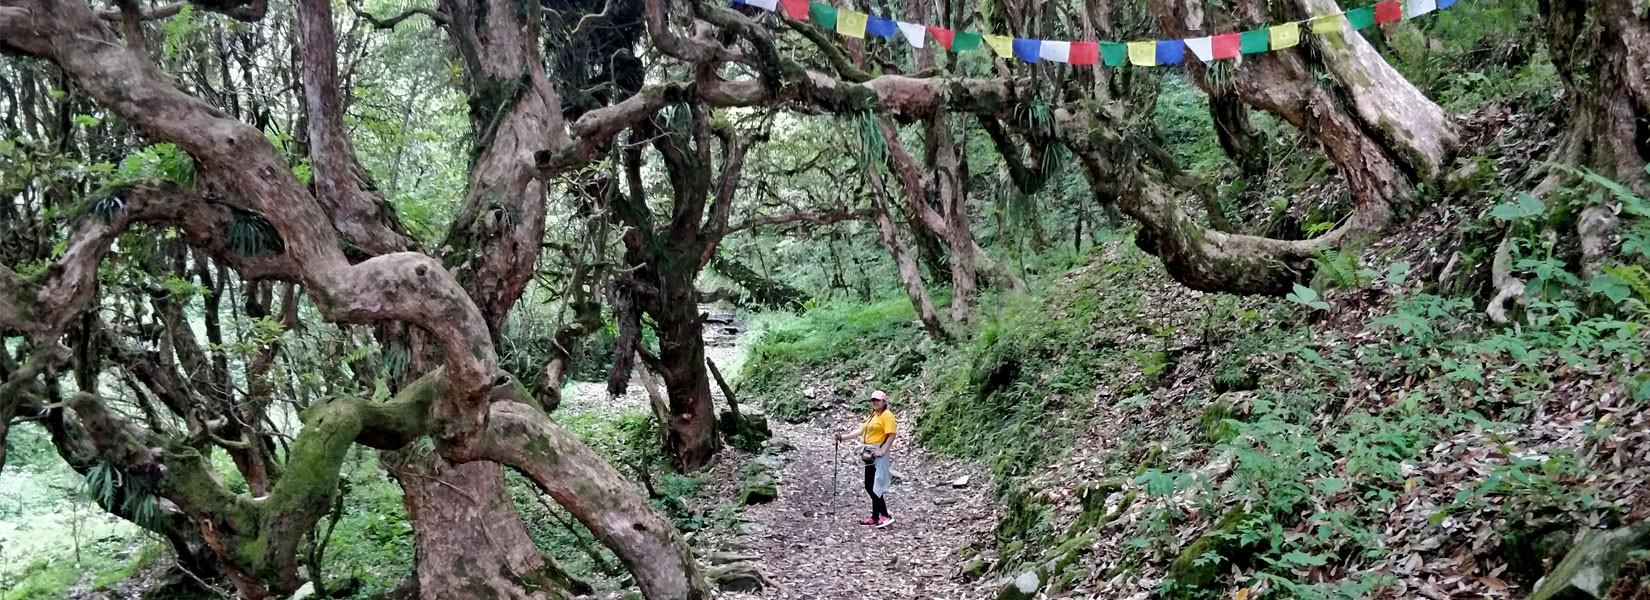 Annapurna Base Camp Trek Solo